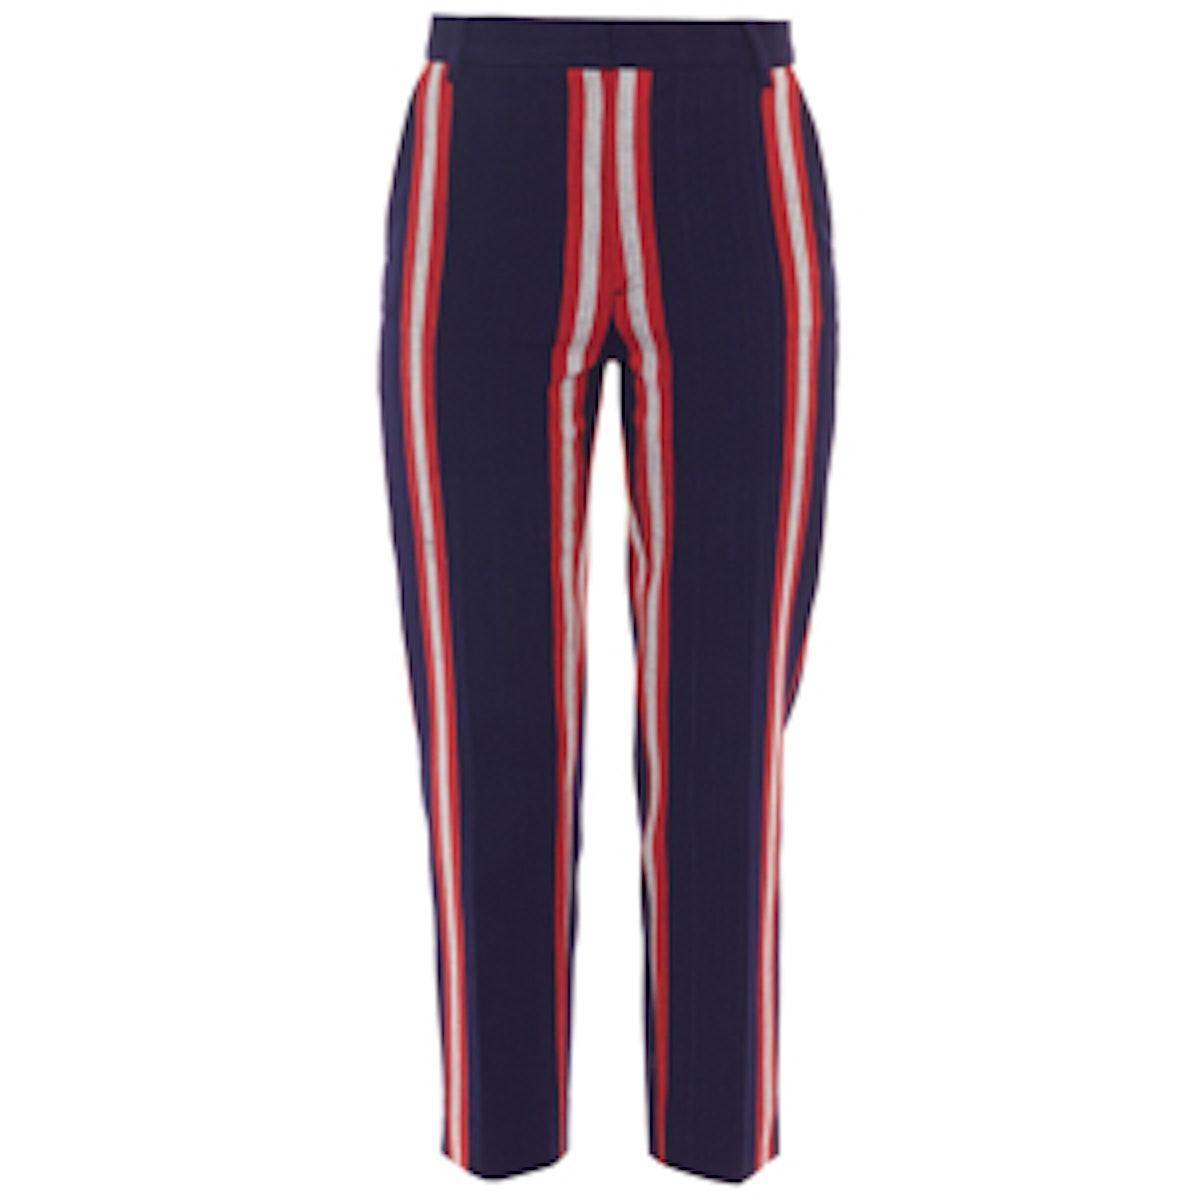 Jean Beccafico Striped Trousers